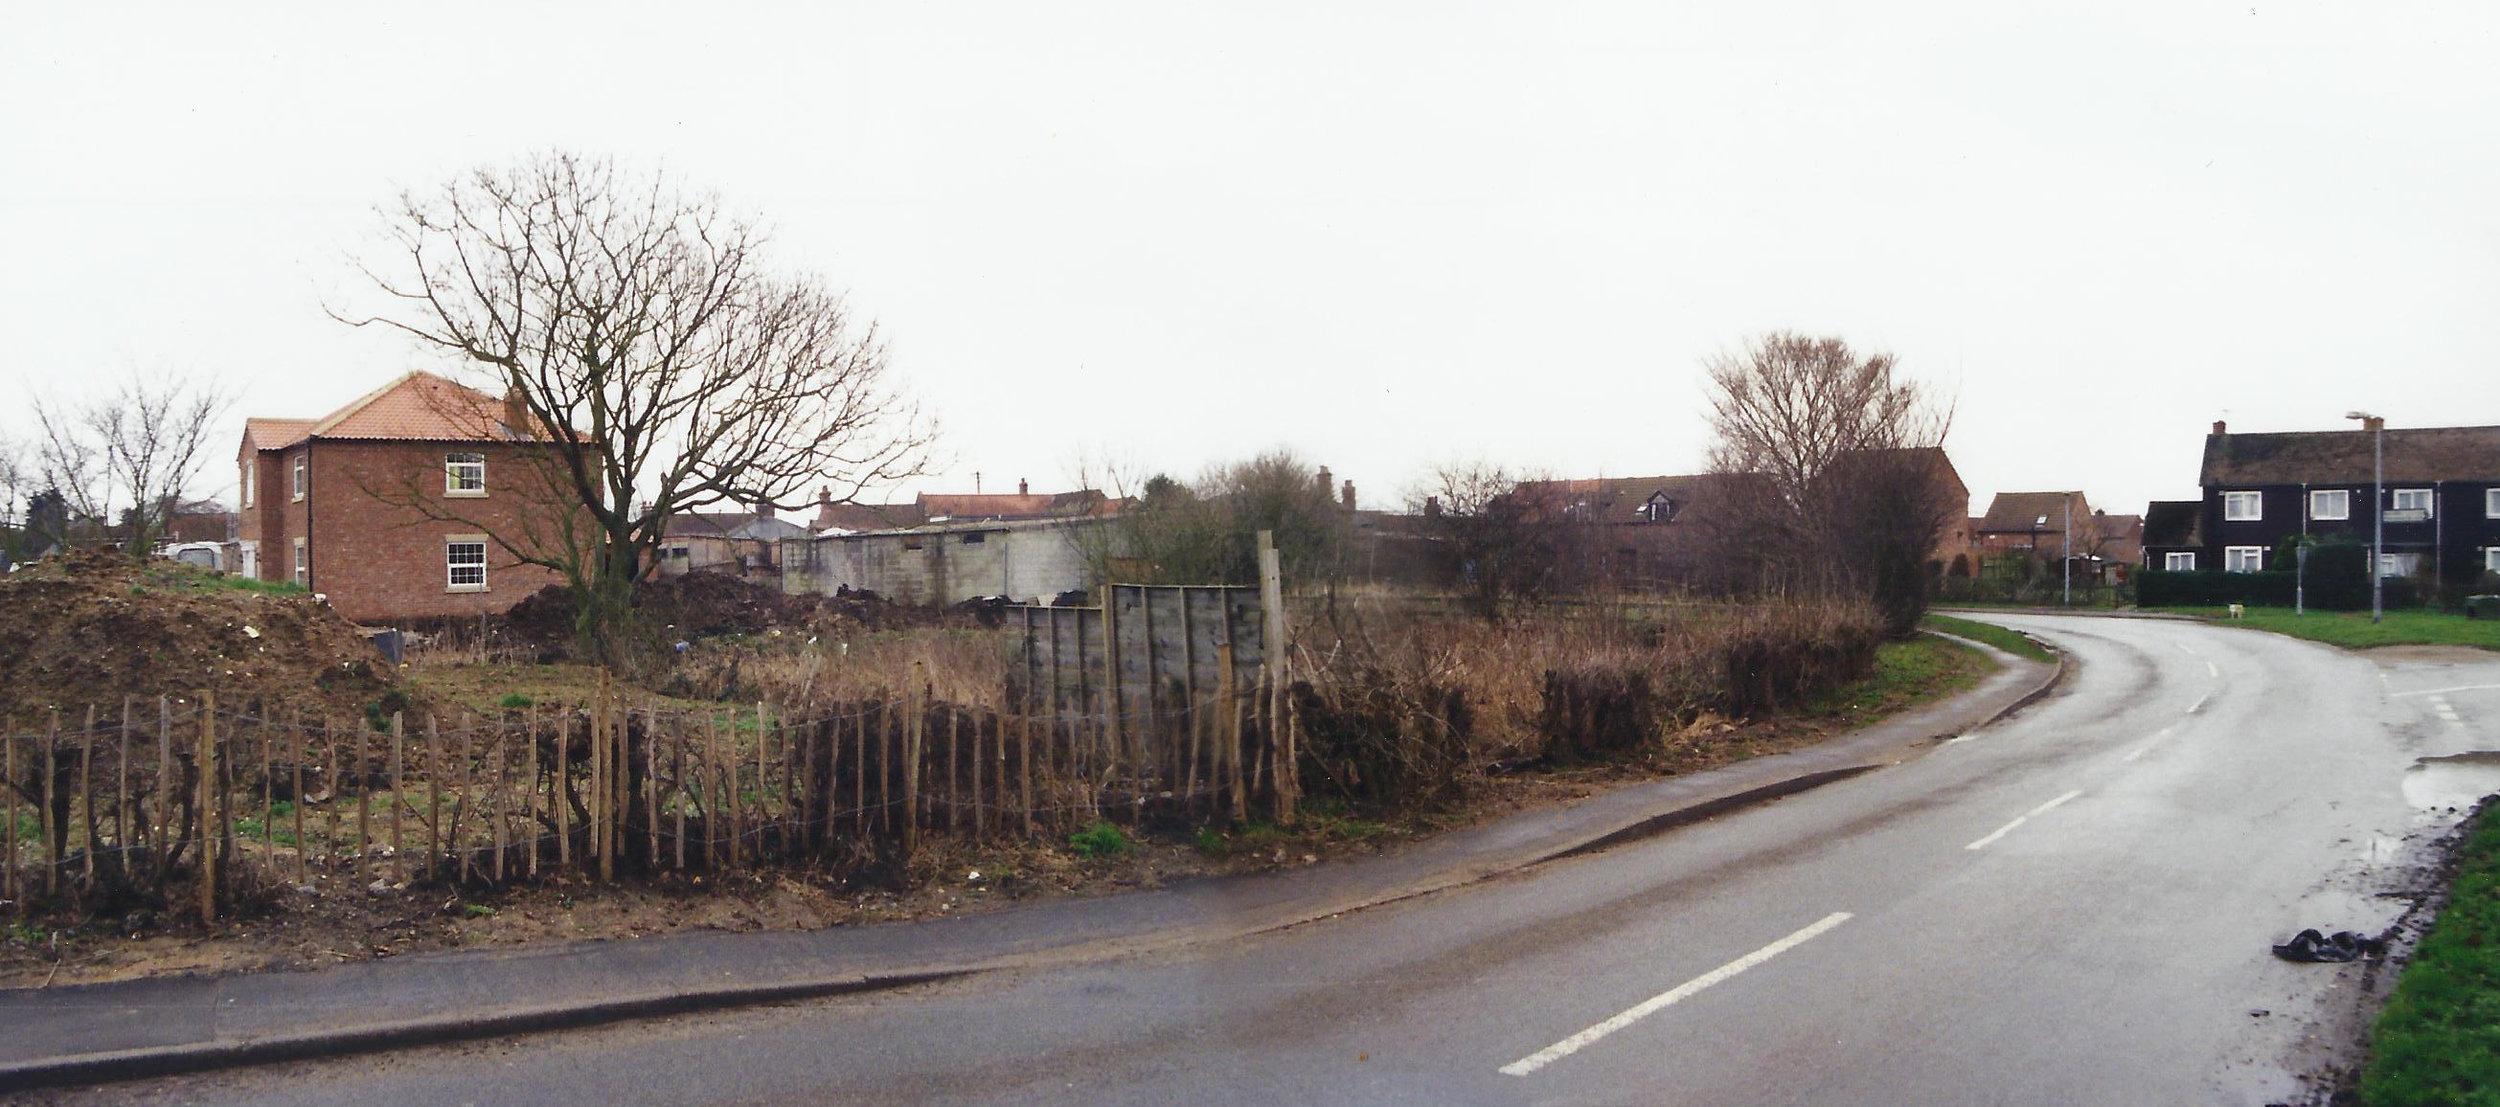 Orchard Mews Prior Site 2 - Samuel Kendall Associates.jpg